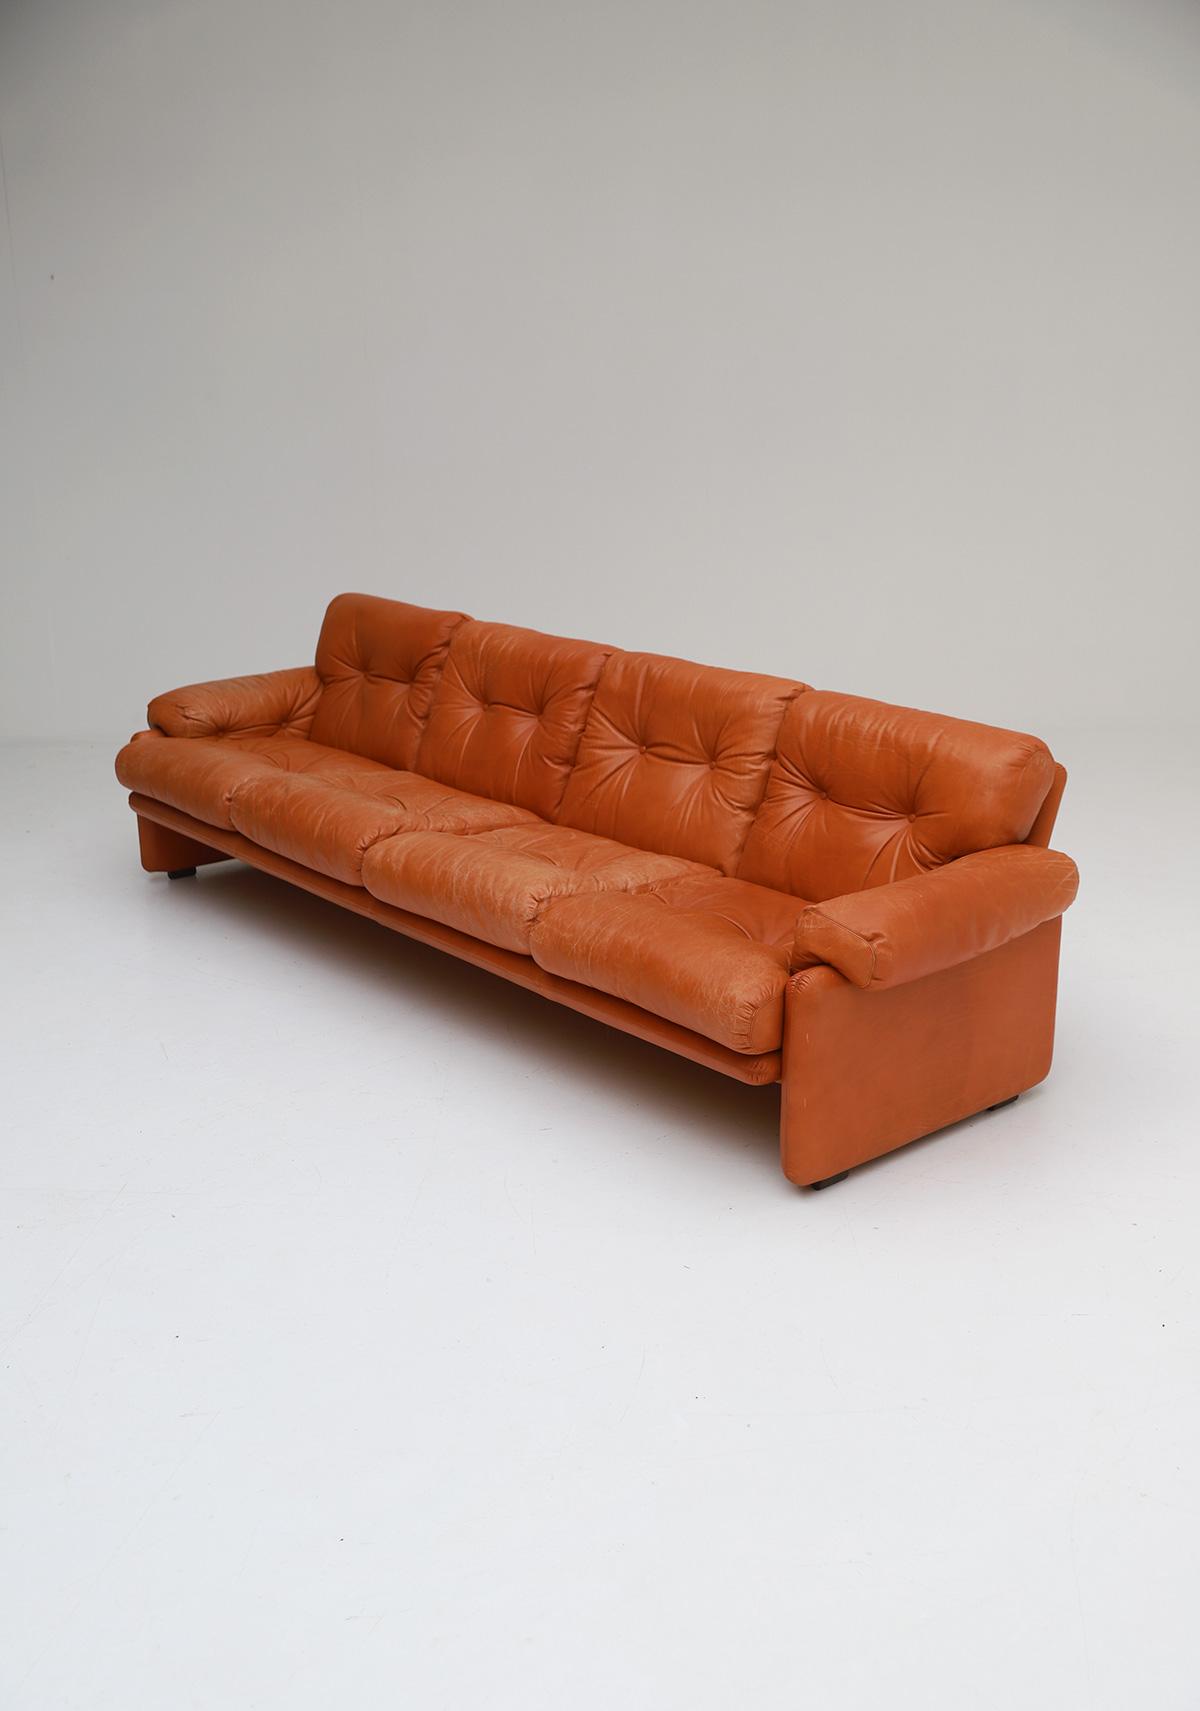 Tobia Scarpa 4 seat Cognac Leather Sofa B&B Italiaimage 4